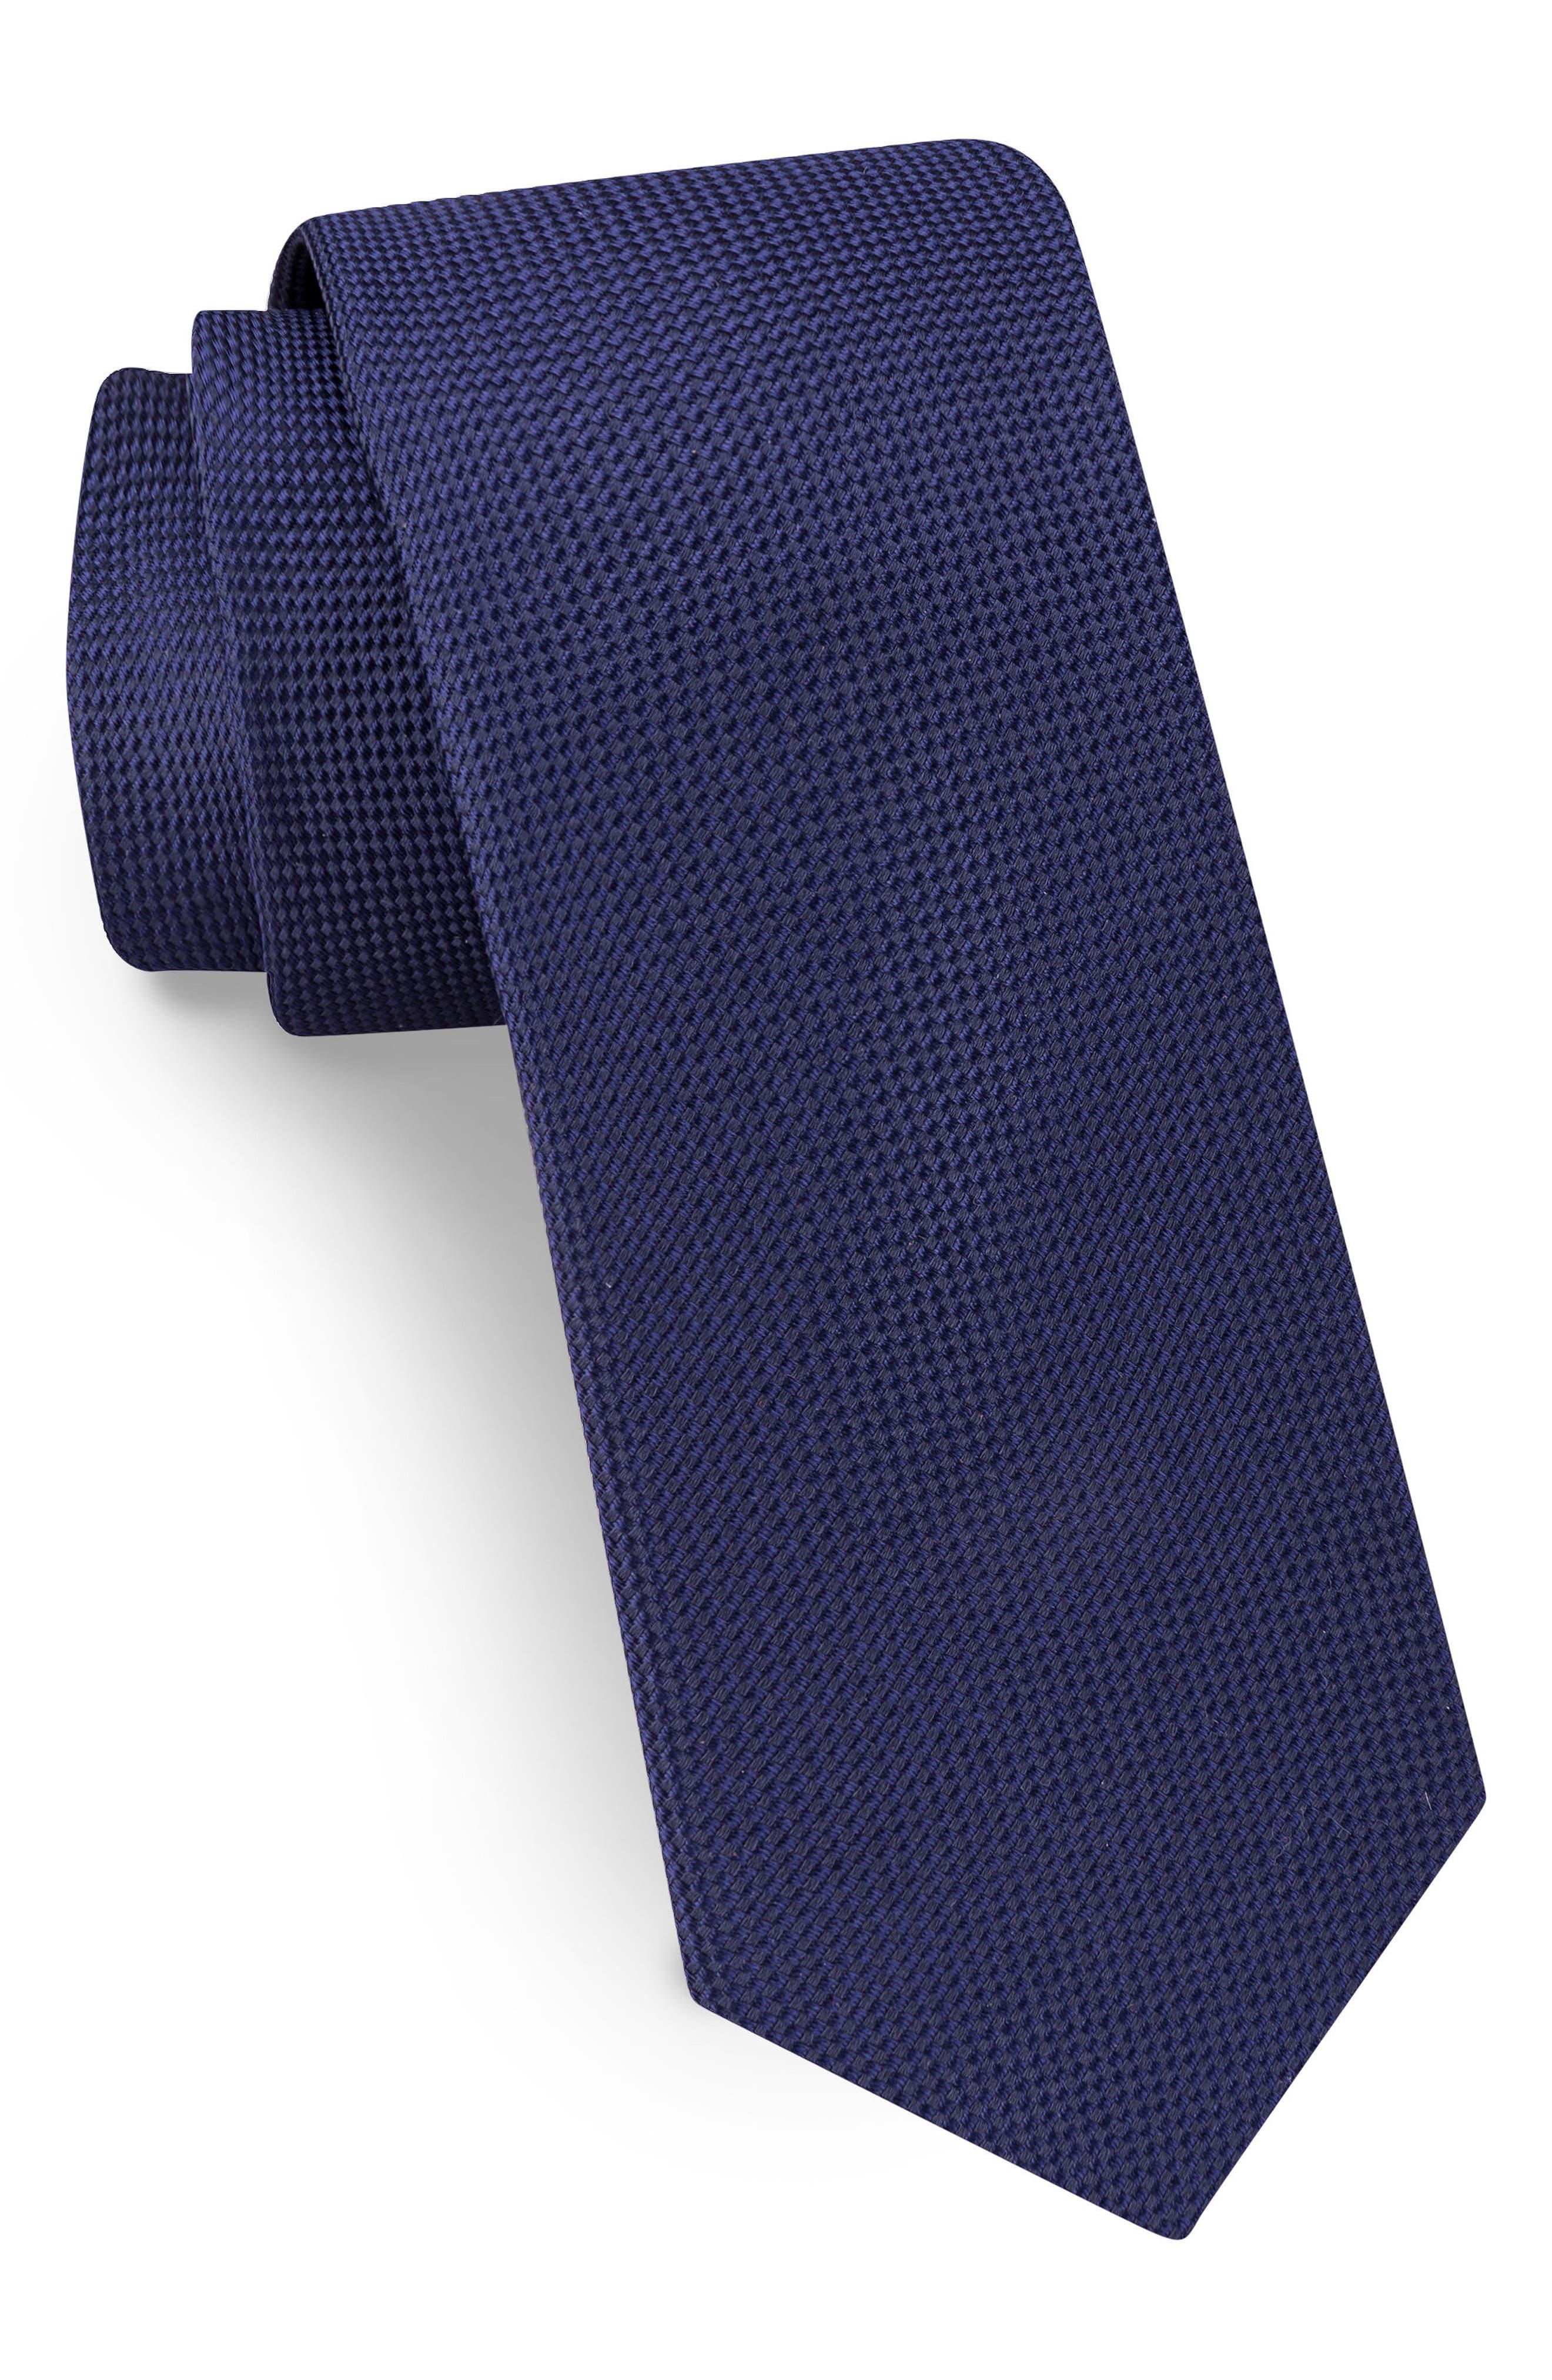 Main Image - Ted Baker London Solid Skinny Silk Tie